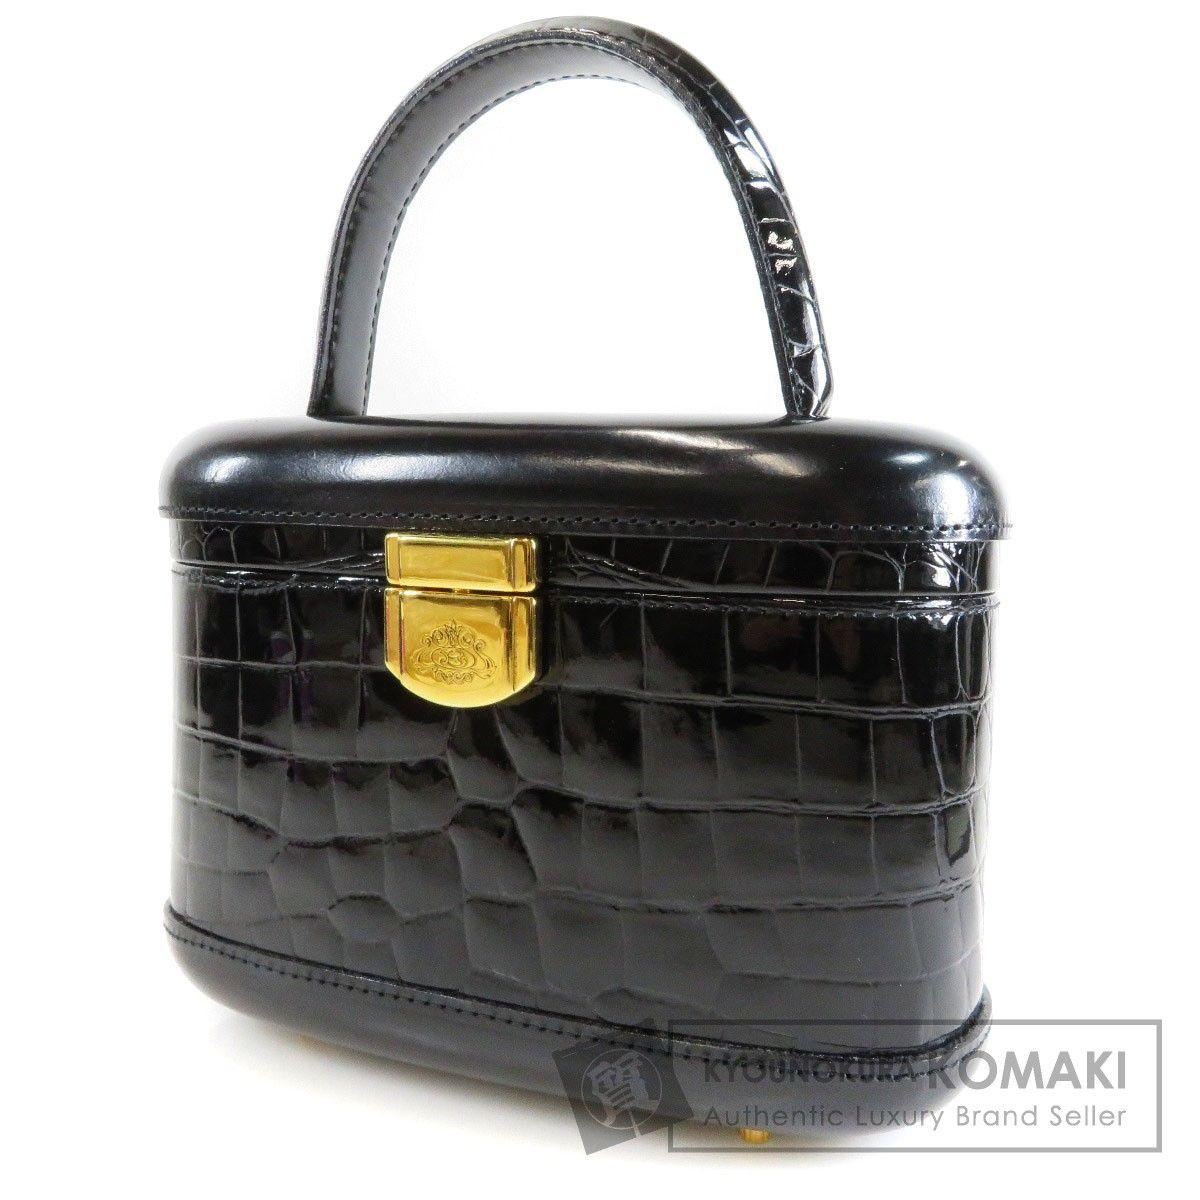 b69d739537 Kyonokura Komaki Brand Cheapest Challenger | Rakuten Global Market:  Authentic SELECT BAG BUCCHERI Handbag Patent leather